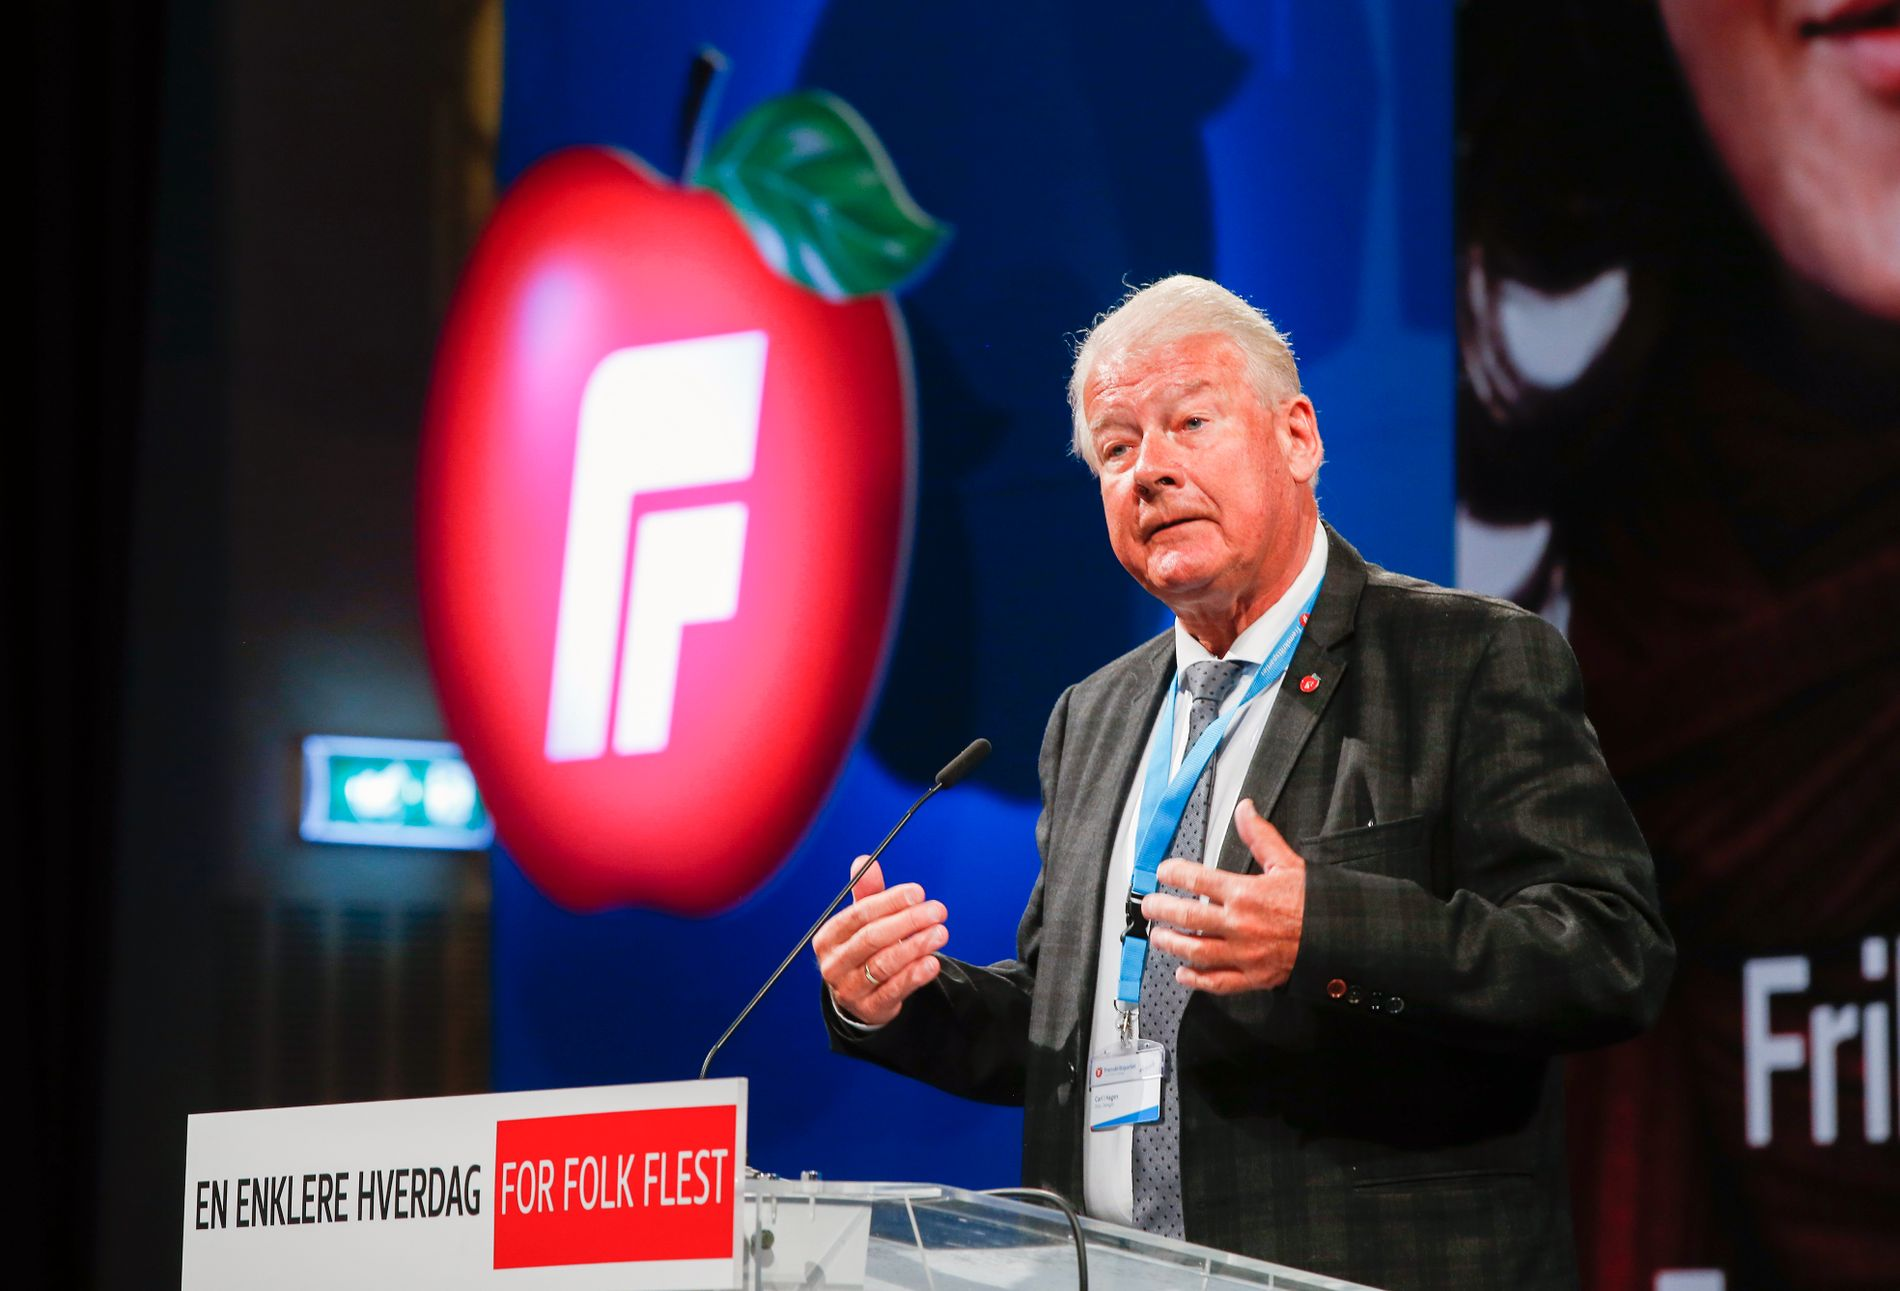 LIGNER PÅ TRUMP: Fremskrittspartiets tidligere formann Carl I. Hagen, her under partiets landsmøte på Gardermoen i april i år.